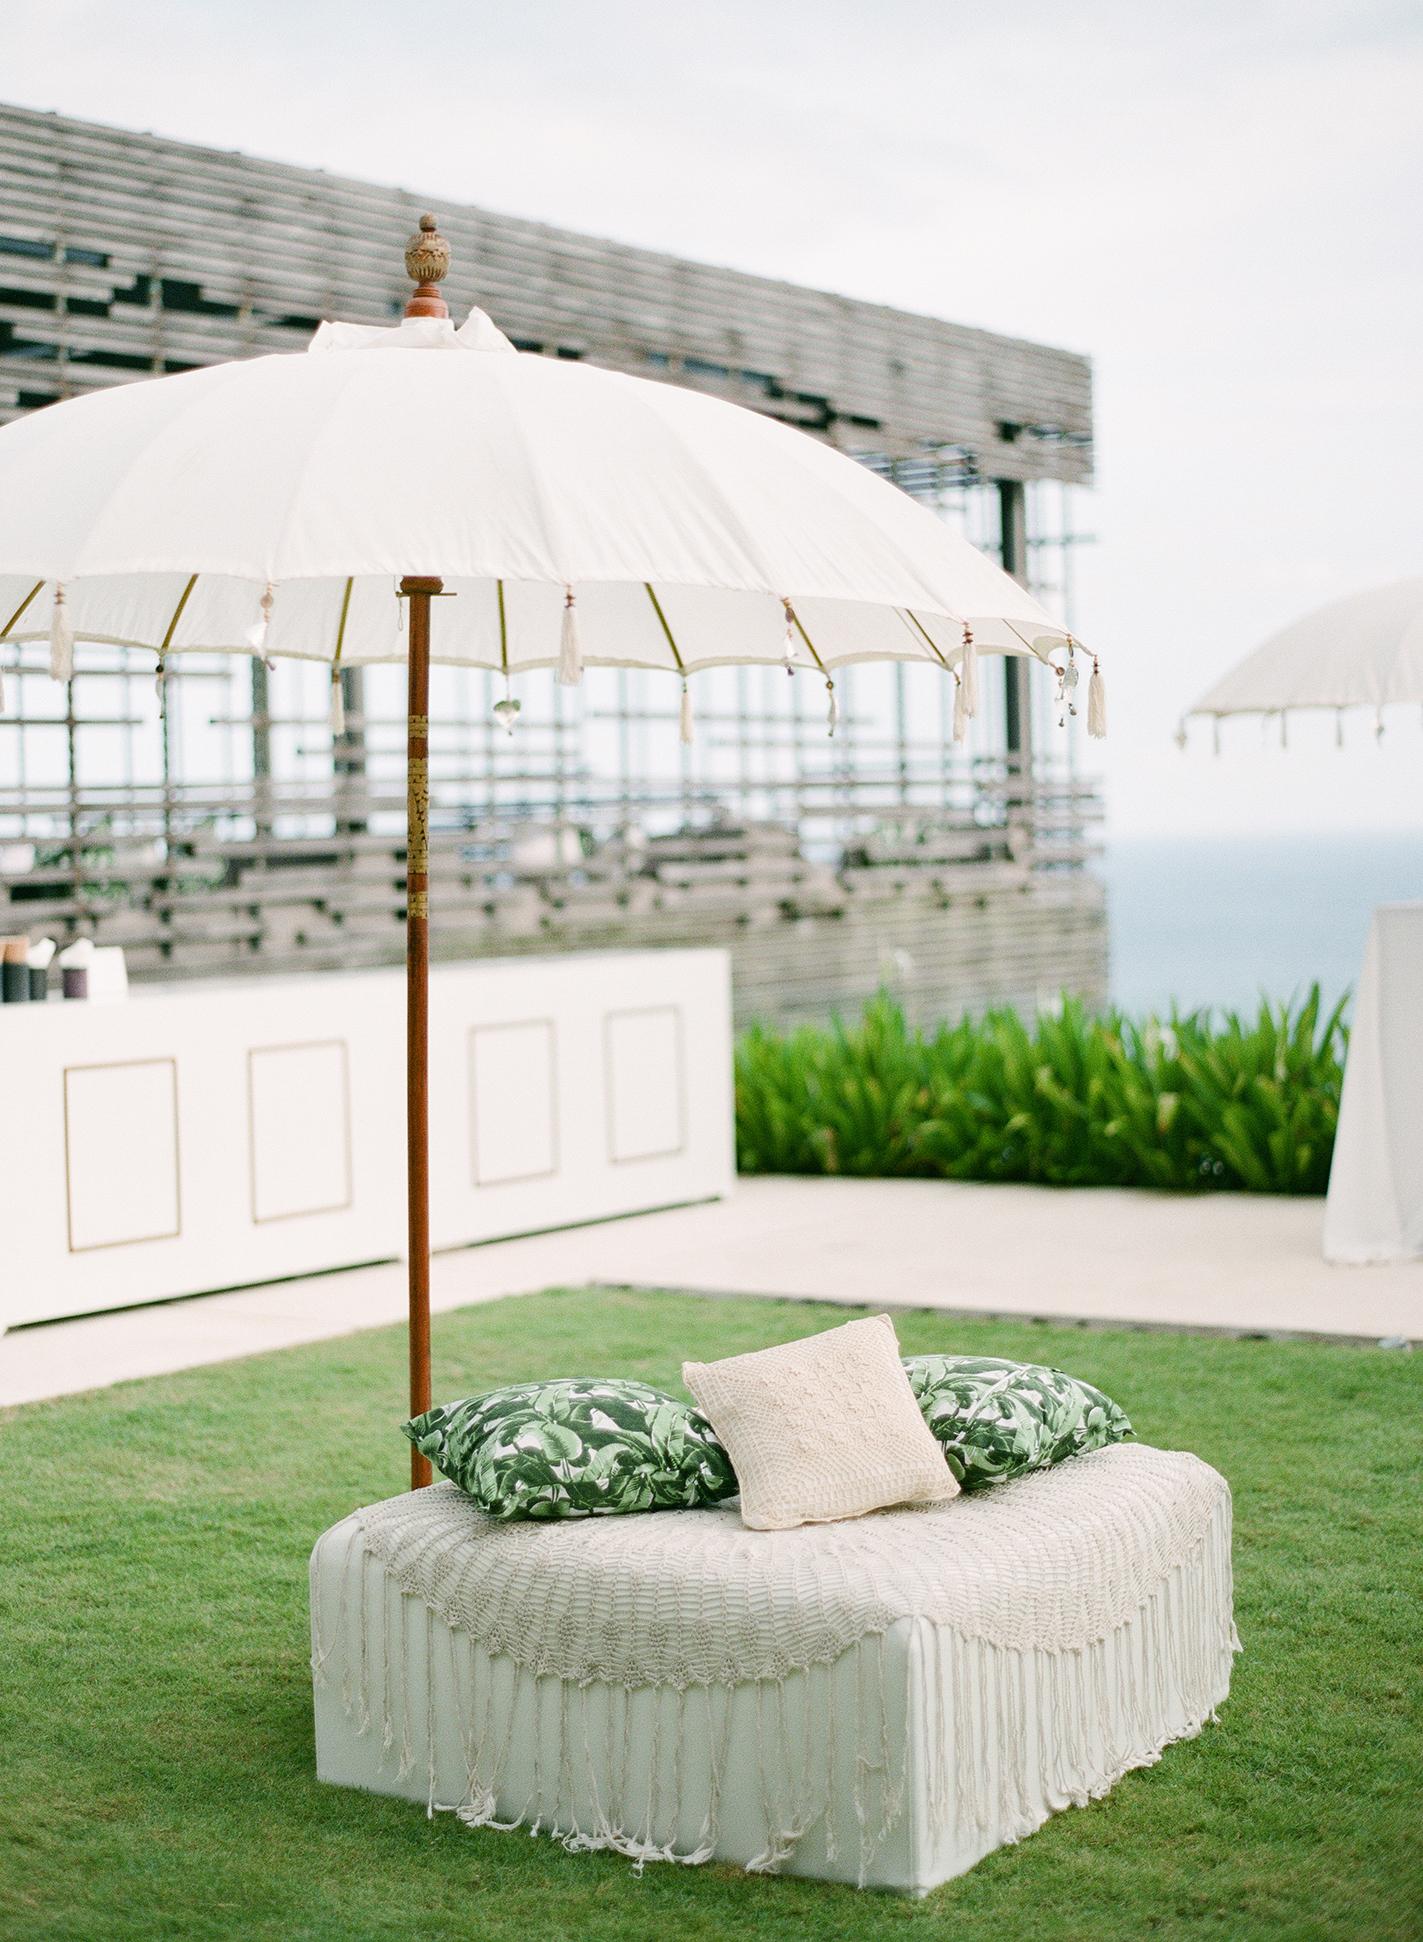 wedding lounge umbrella over white chair